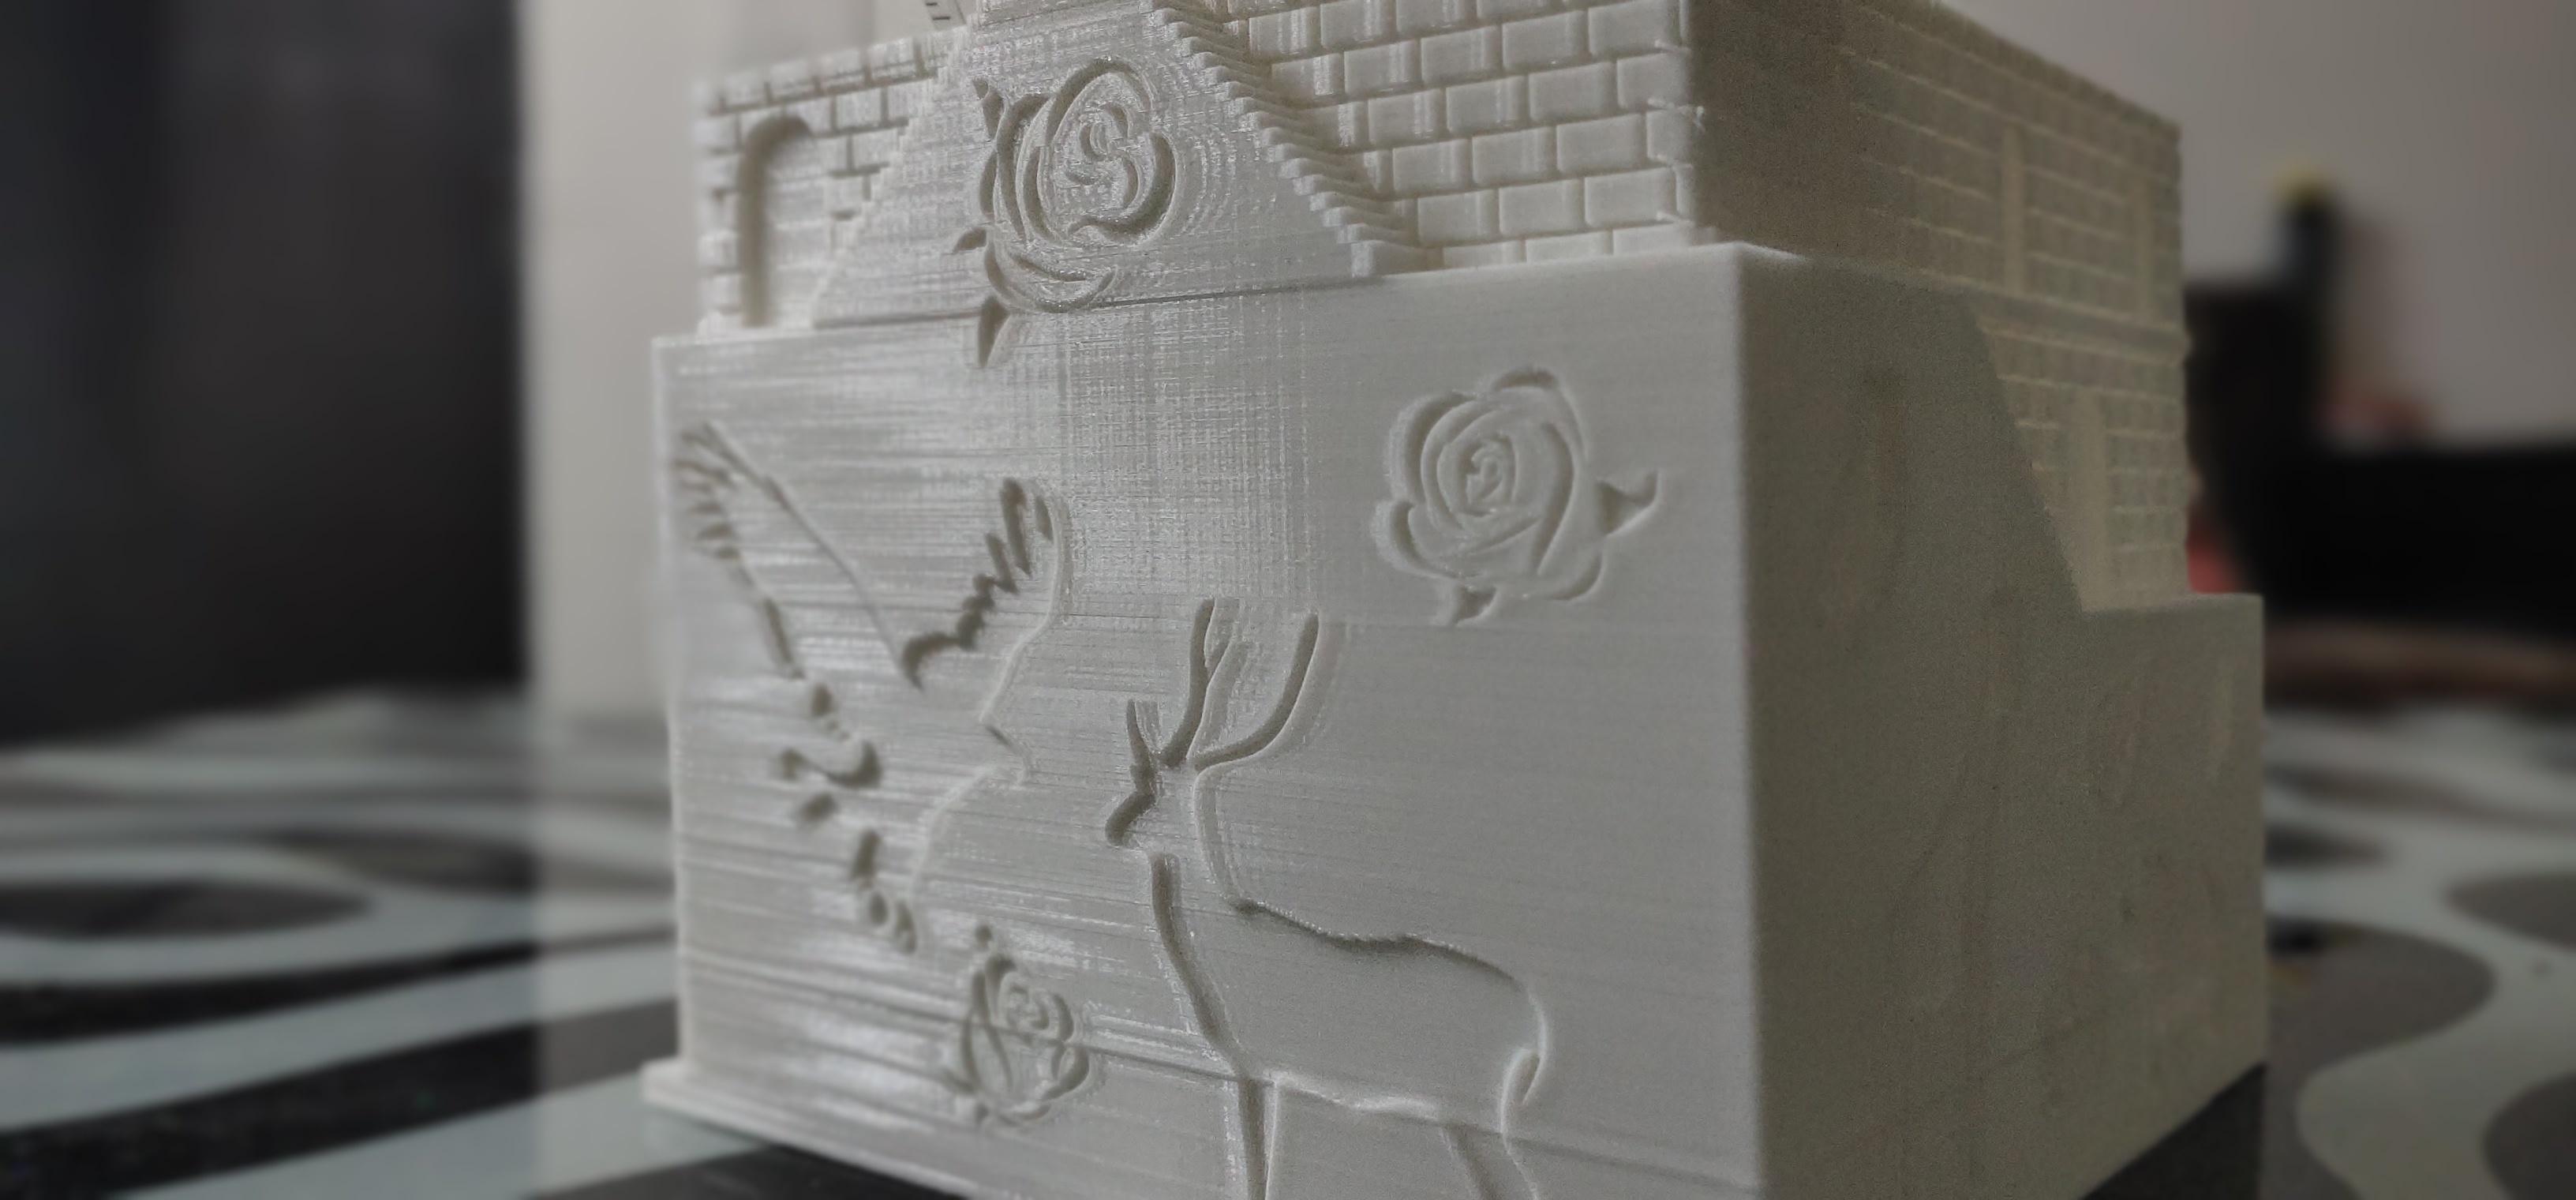 IMG_20200928_155907.jpg Download STL file Plant and desk pot • 3D printer object, FutureDesigns